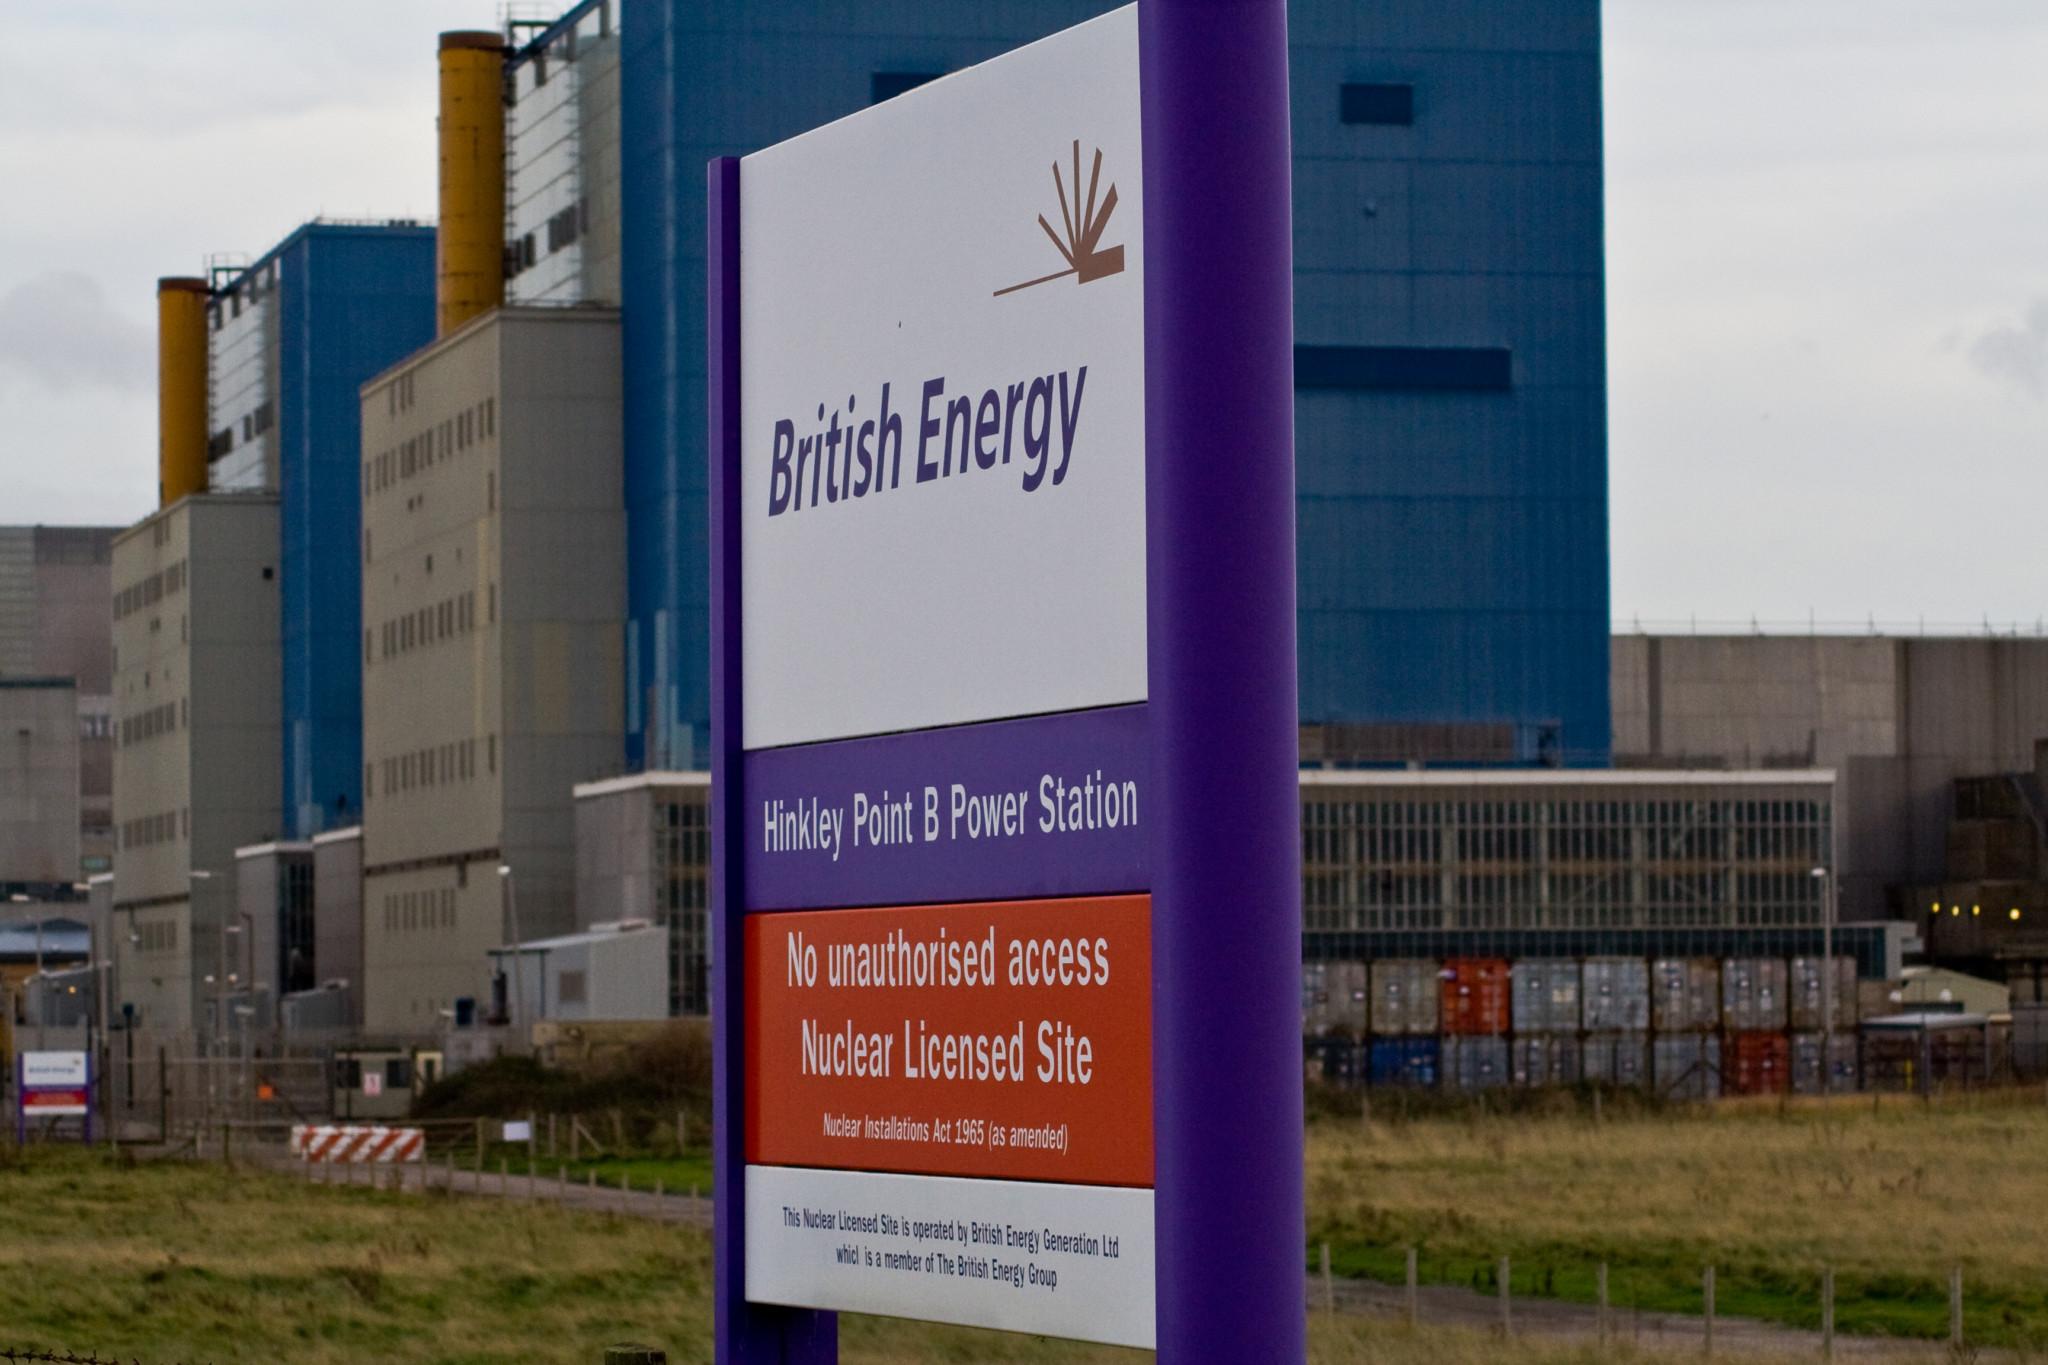 royaume-uni energie nucleaire hydrogene vert - L'Energeek